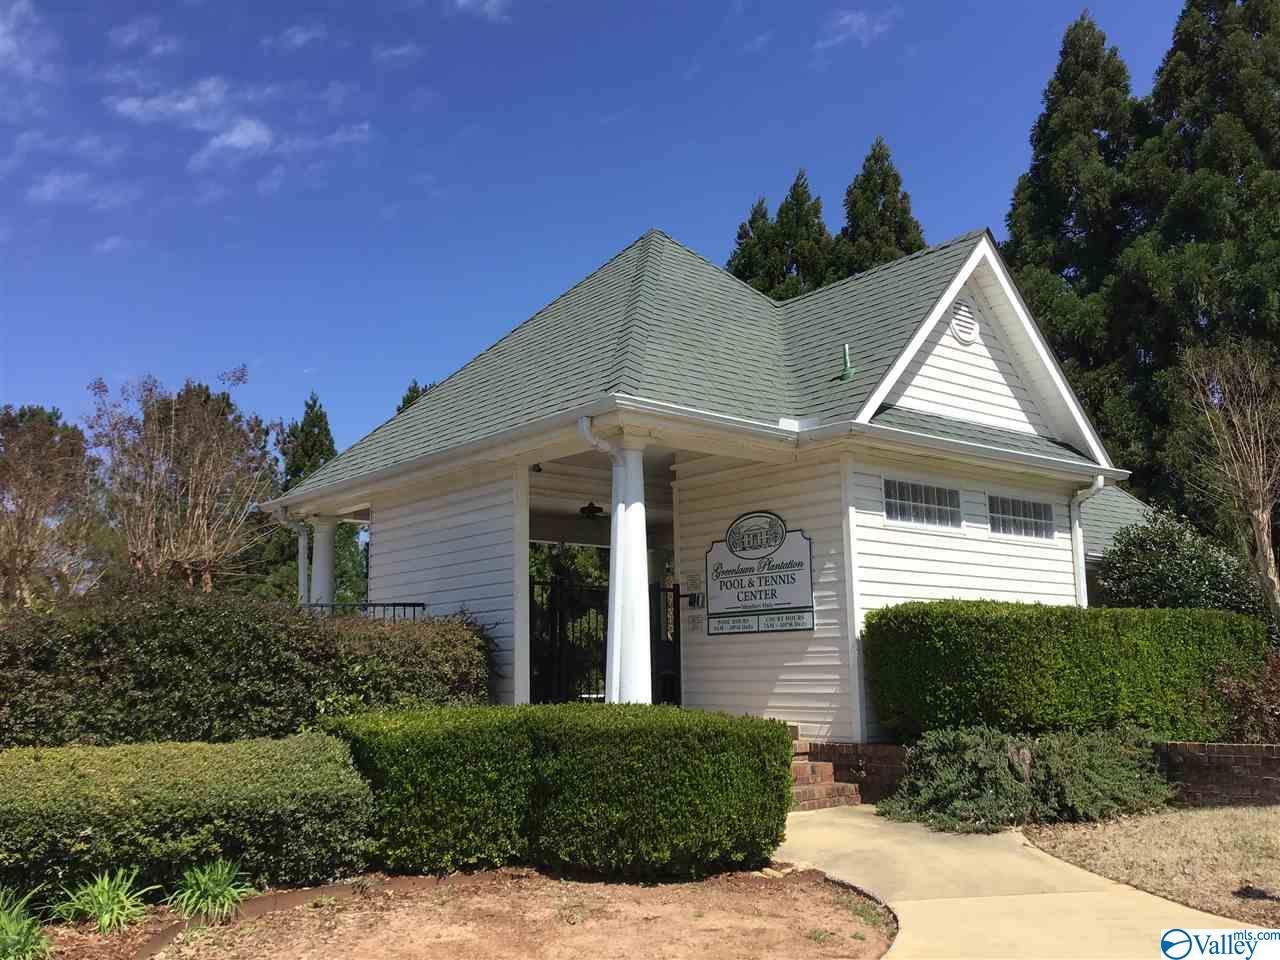 134 Pavilion Drive Meridianville Alabama